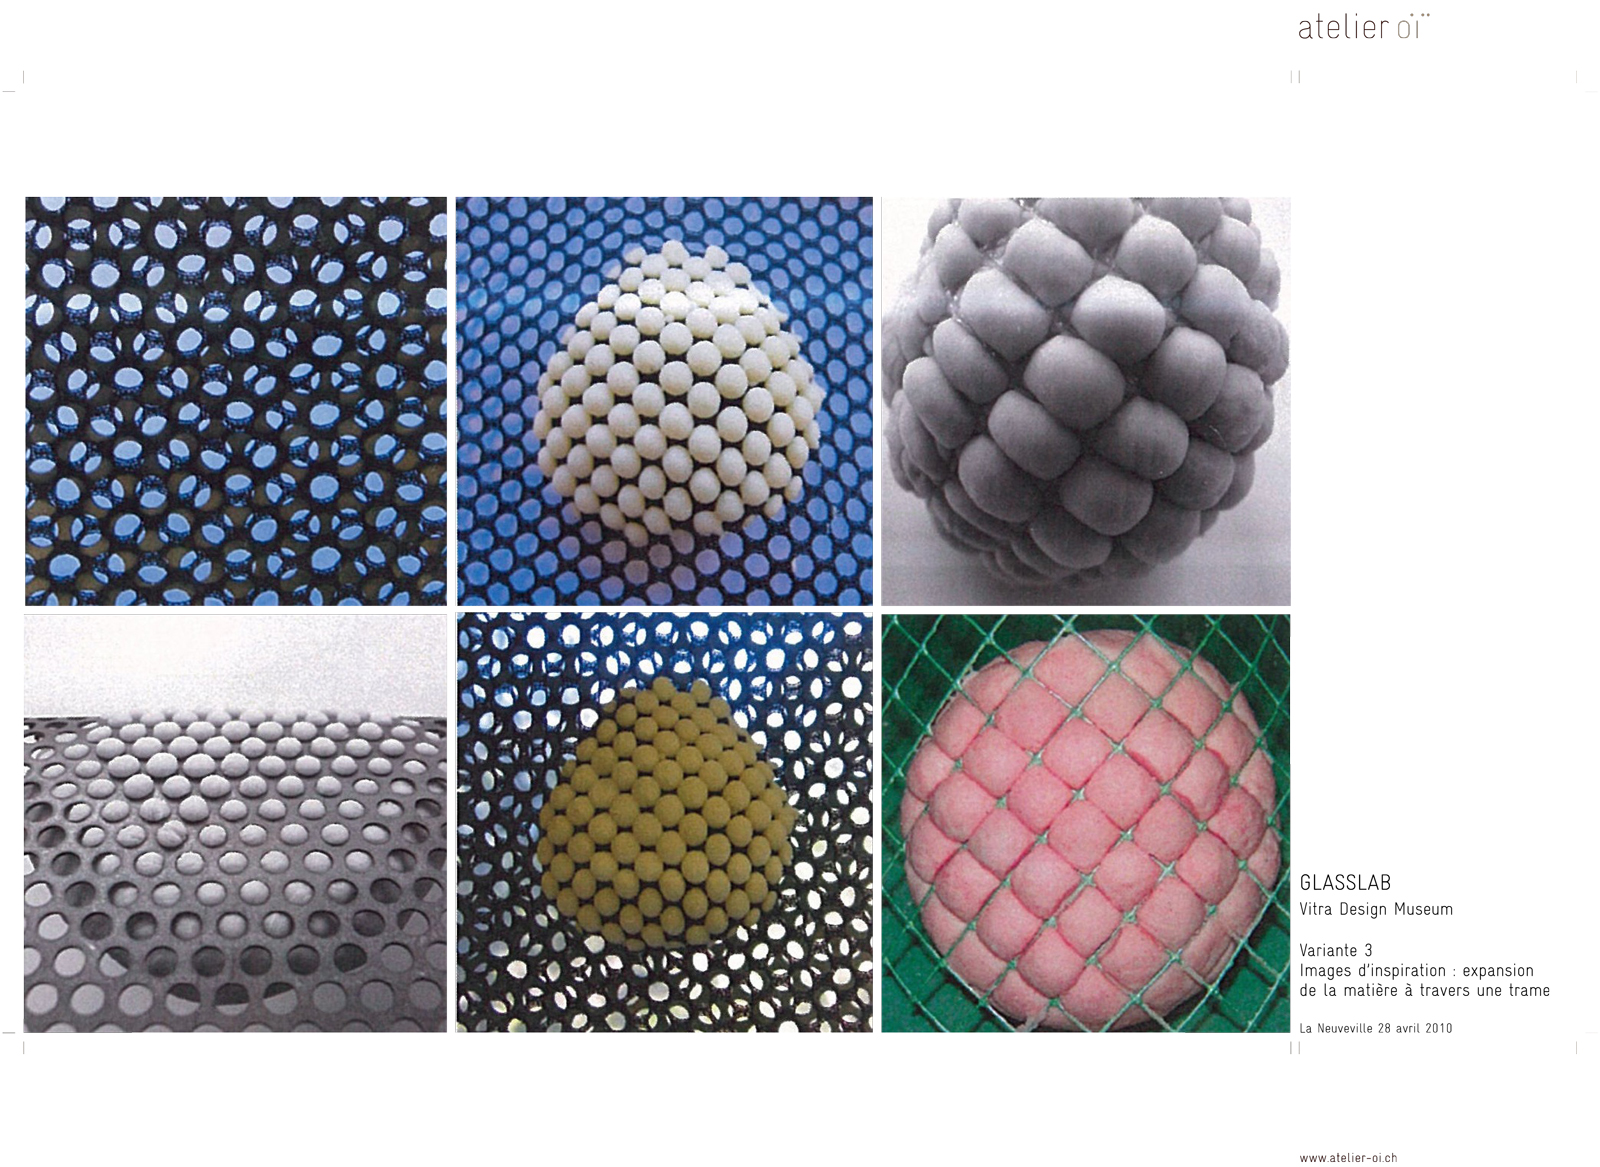 Atelier Oï GlassLab design program